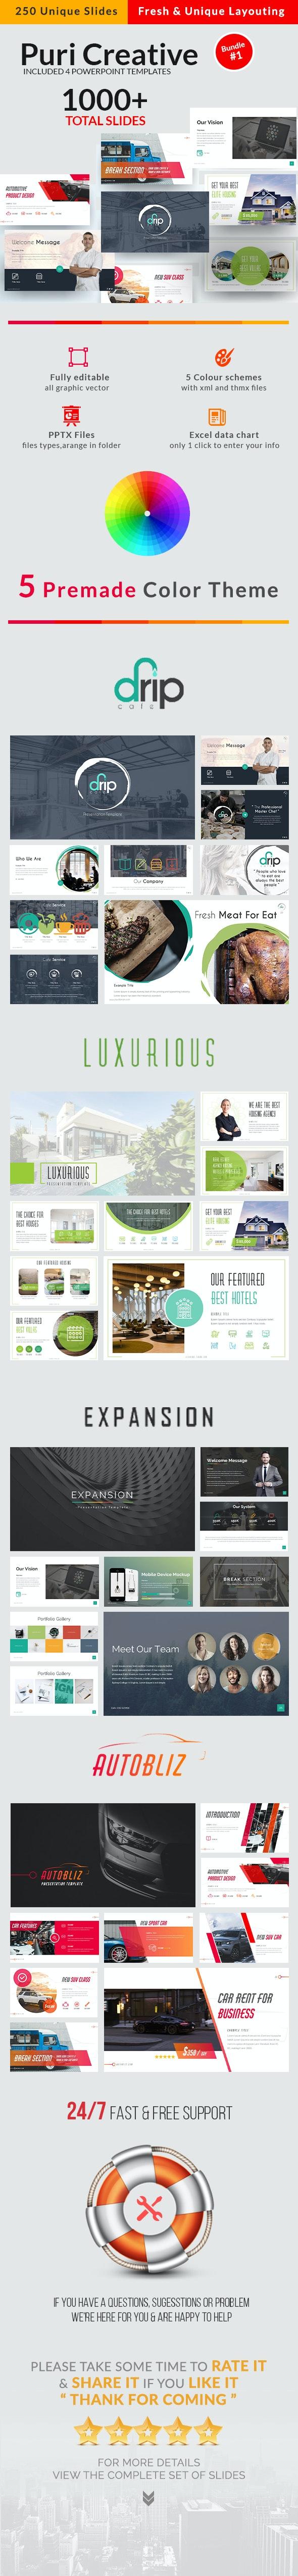 PuriCreative Powerpoint Bundle 1 - Business PowerPoint Templates